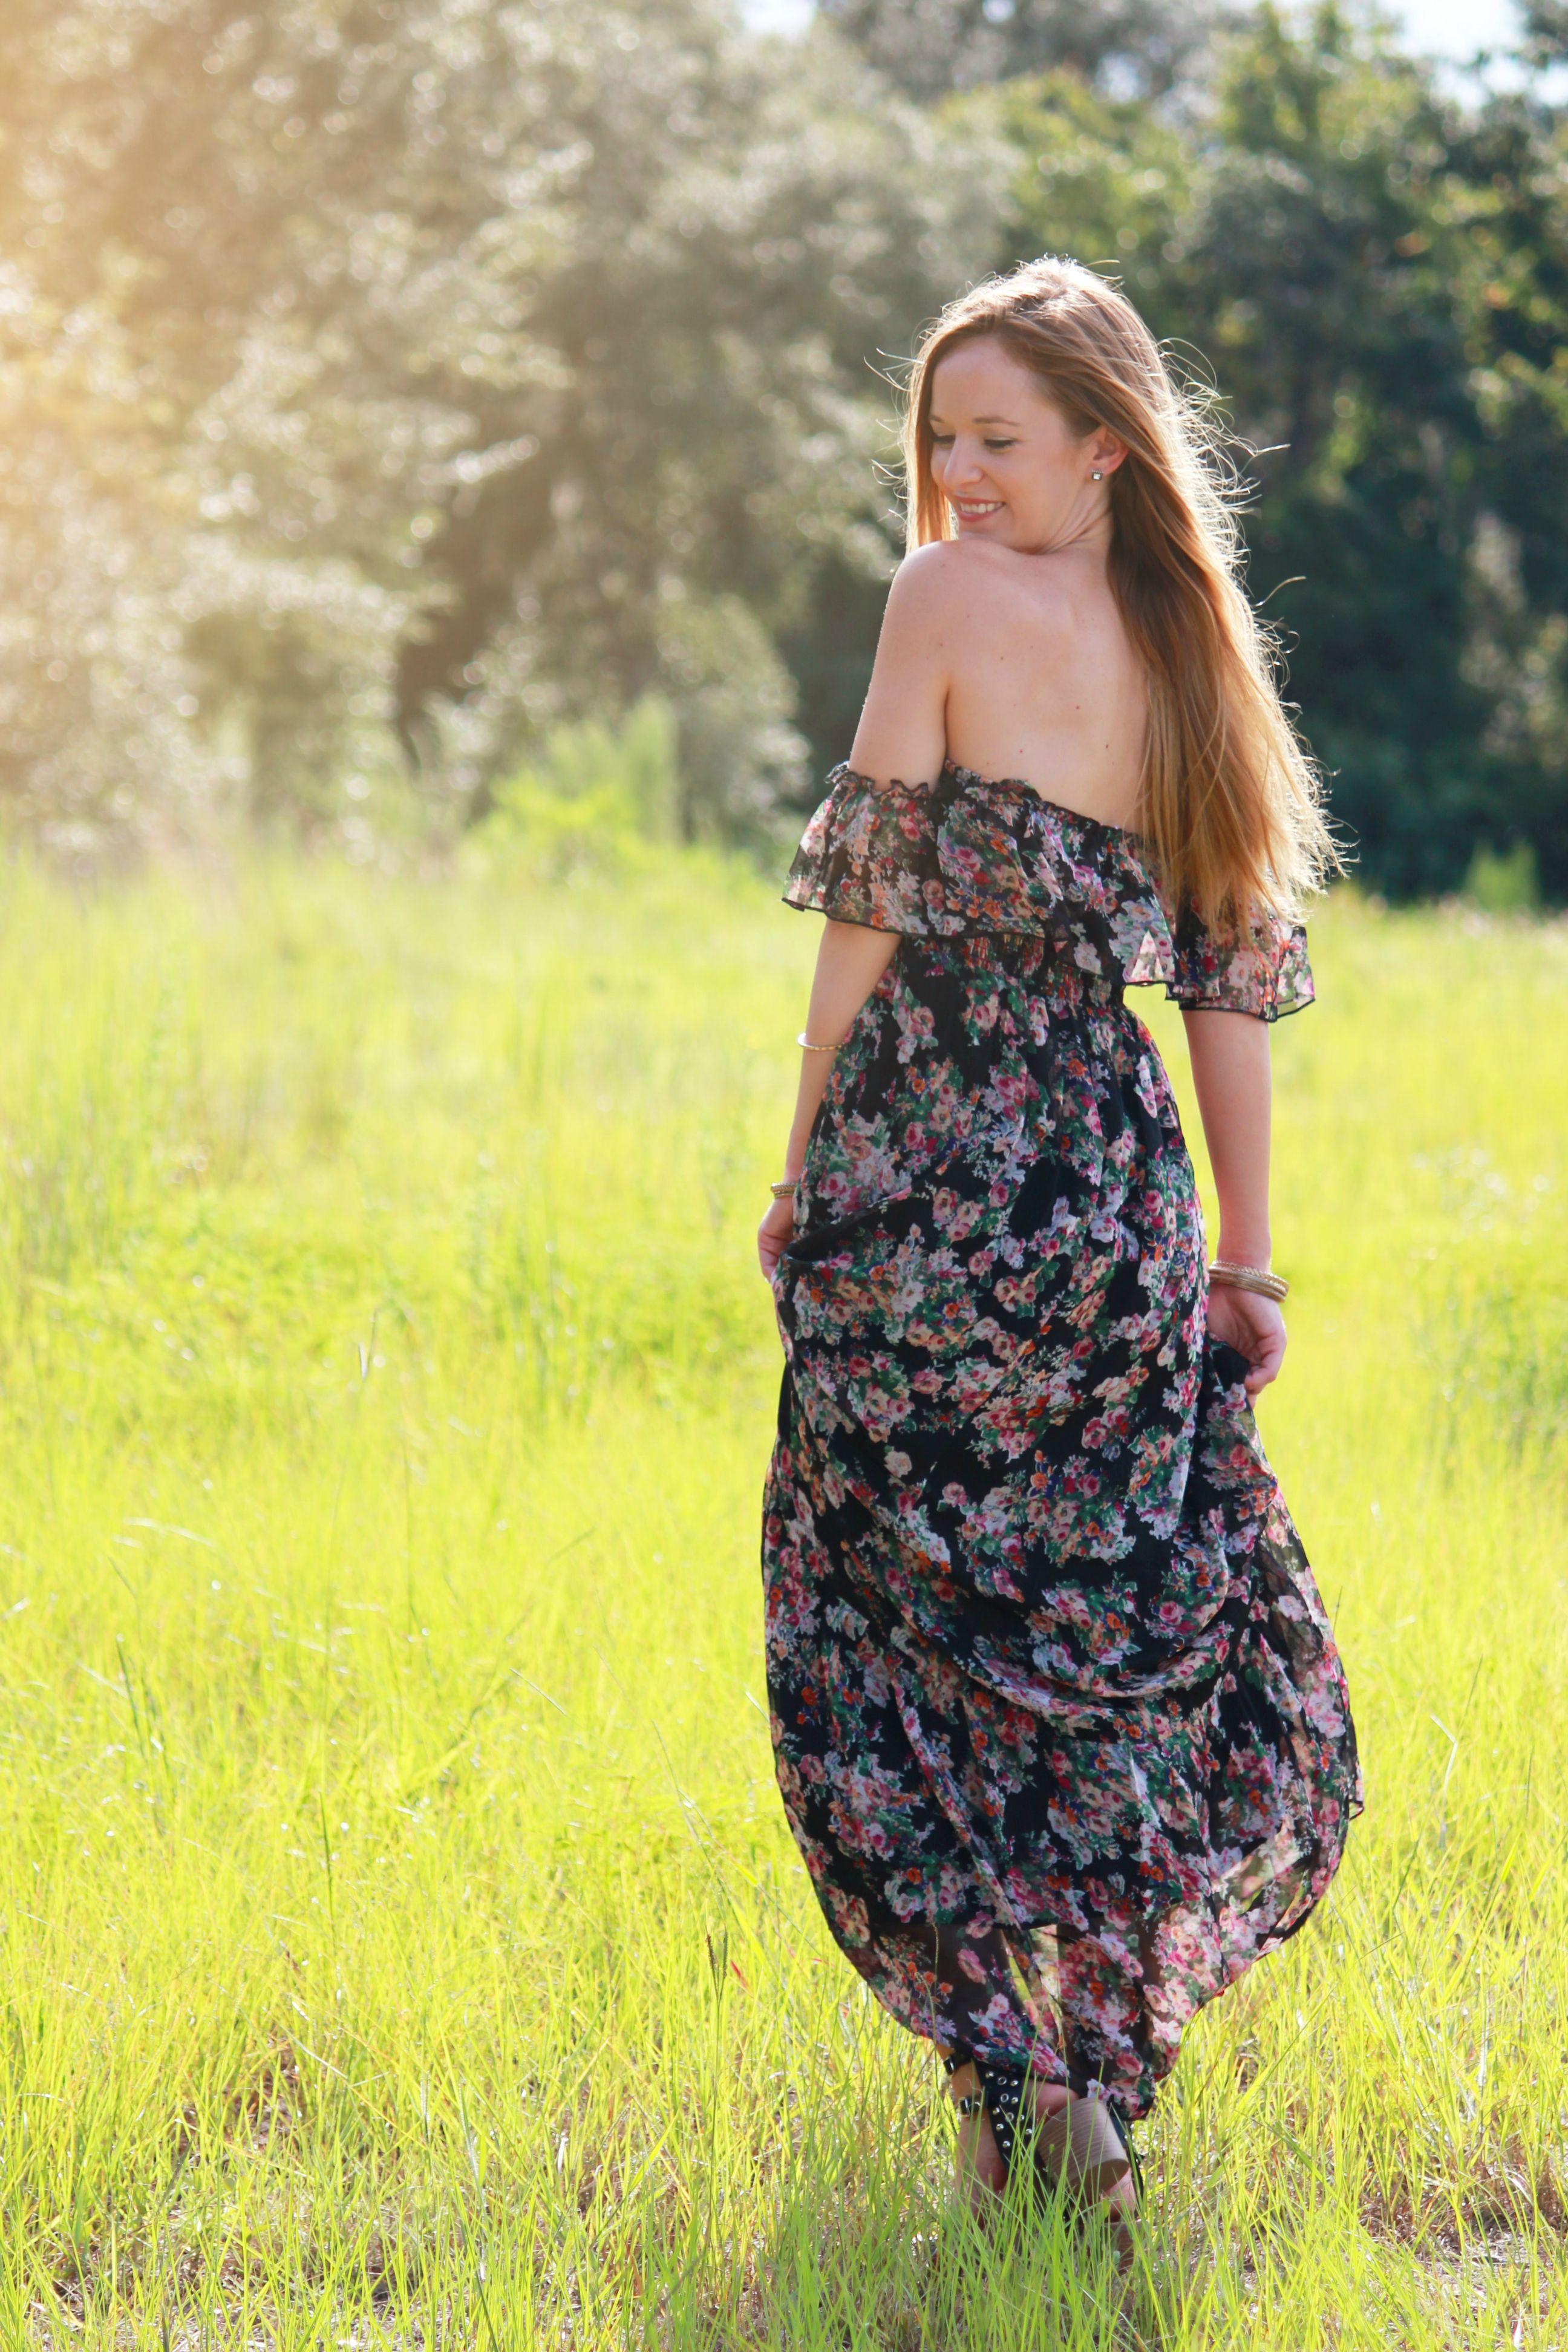 ami clubwear dress, floral maxi dress, casual summer outfit, Summer maki dress